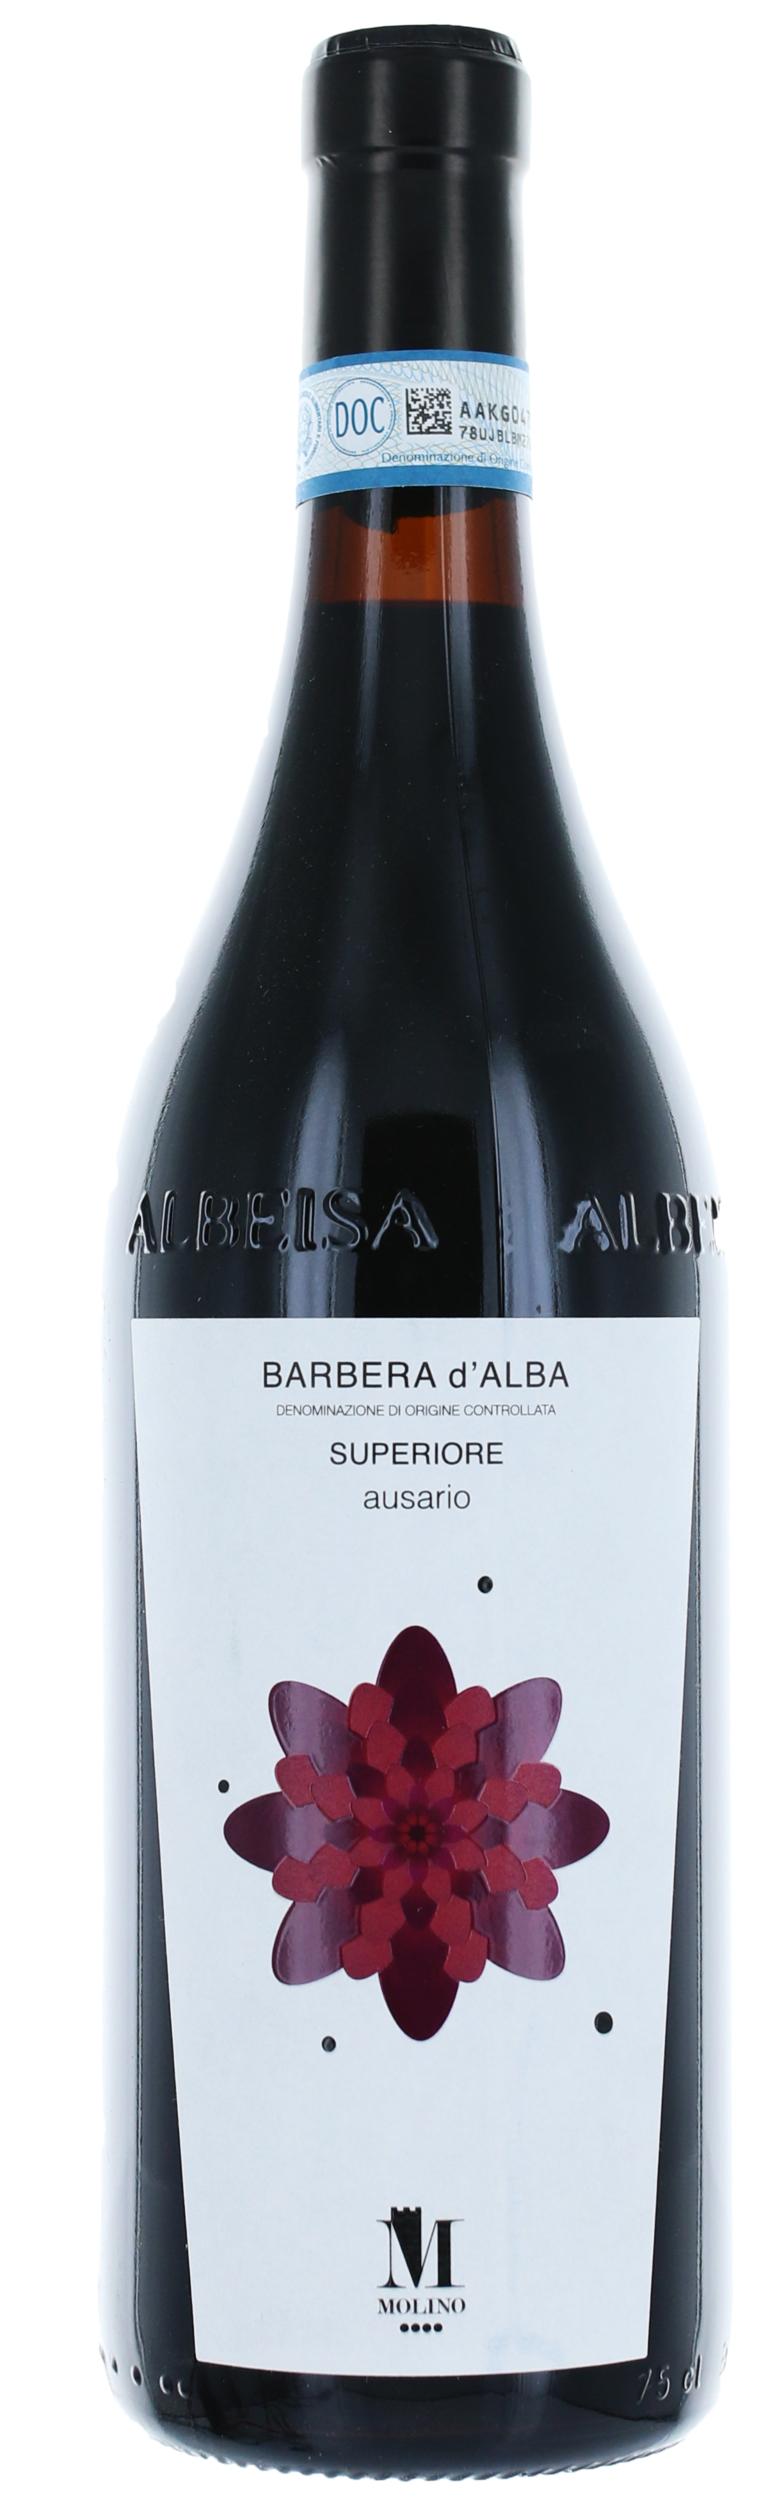 Barbera d\'Alba Superiore - Ausario - Agricola Molino - 2017